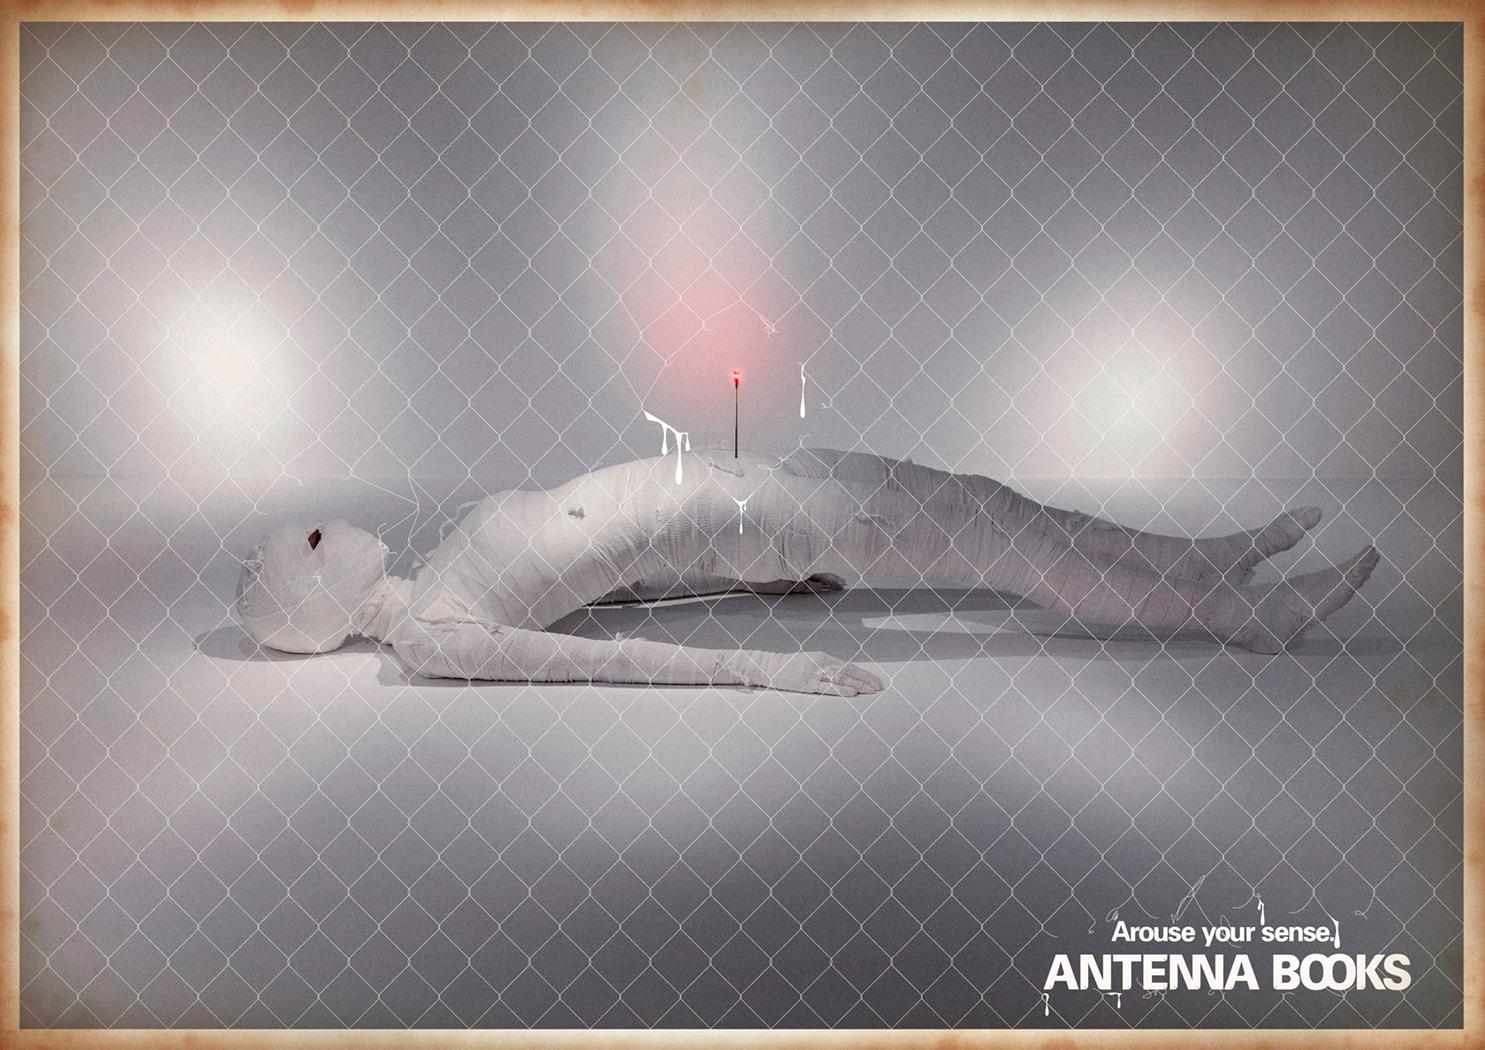 Antenna Books Business Card